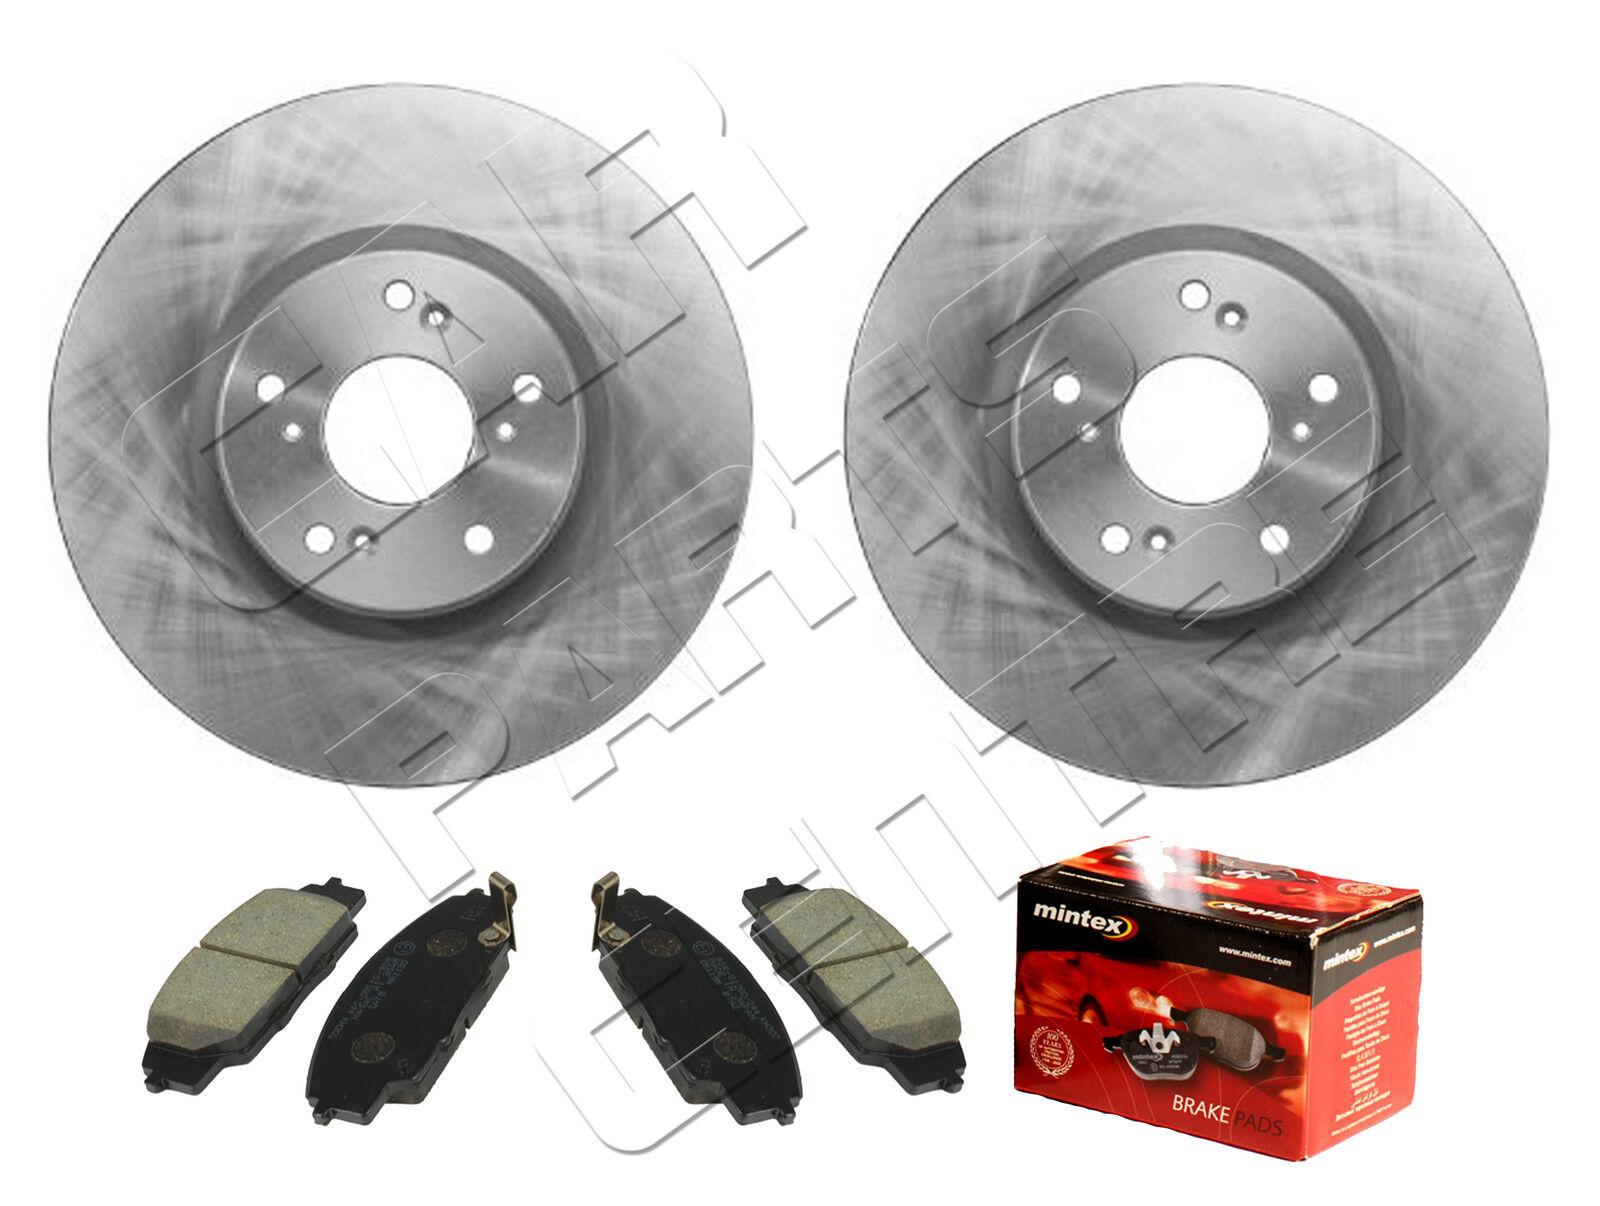 Honda CIVIC TYPE R FN2 06 disques de frein mintex pads front rear